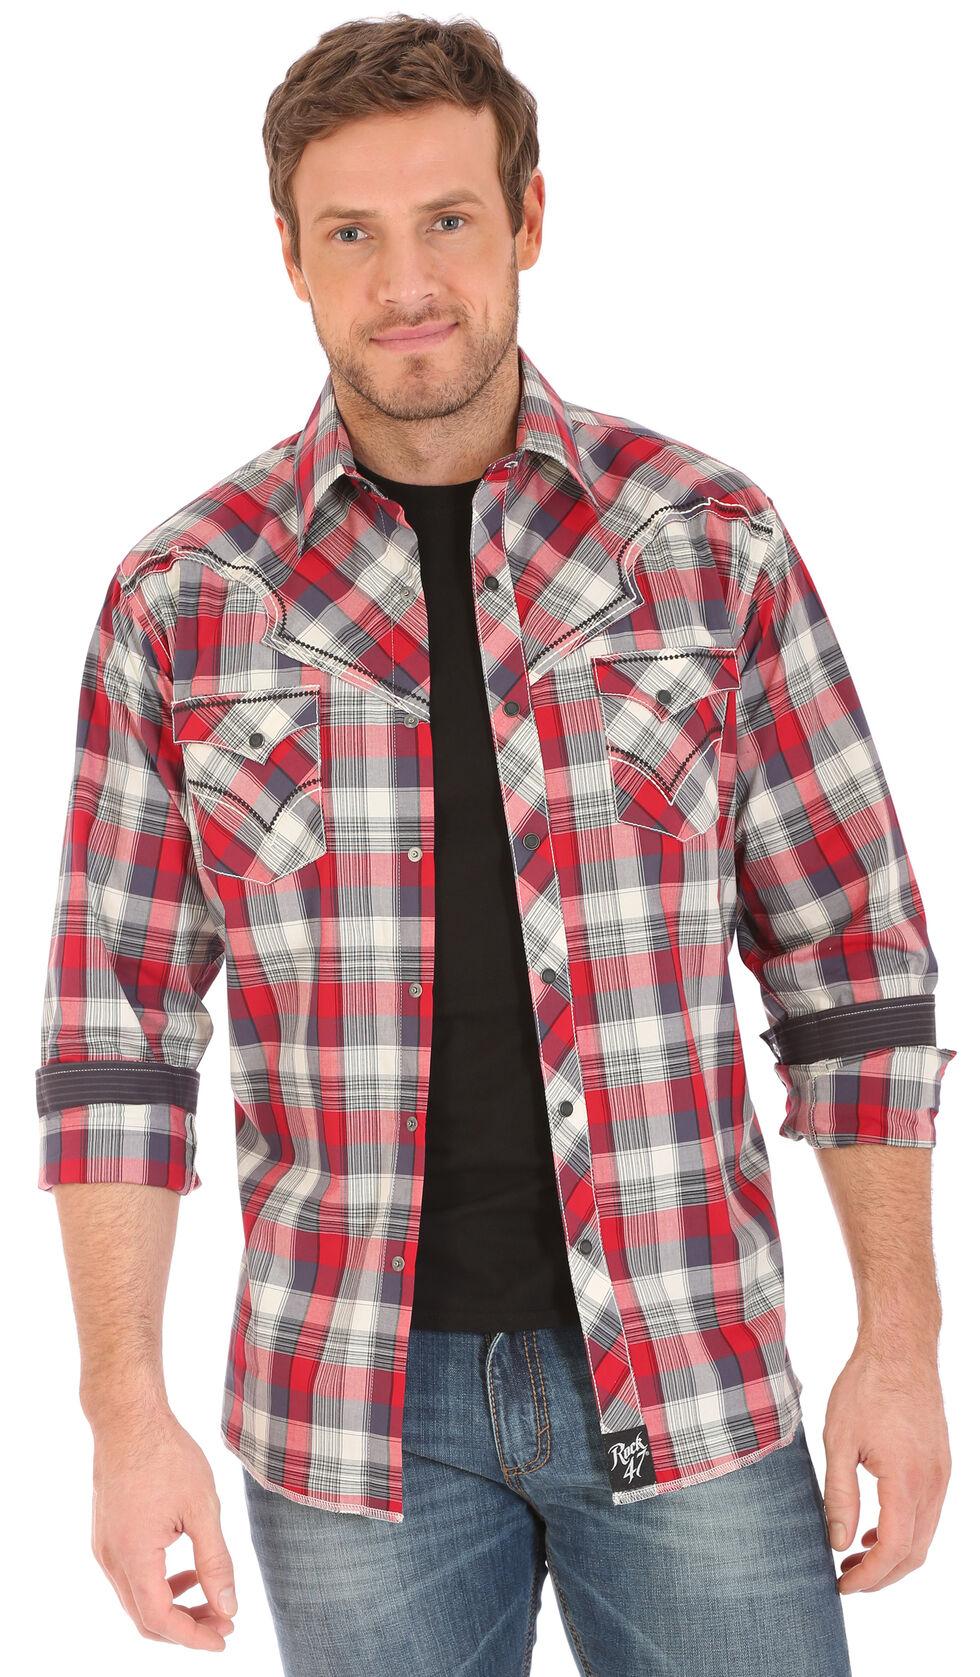 Wrangler Rock 47 Men's Plaid Two Pocket Long Sleeve Snap Shirt, Red, hi-res